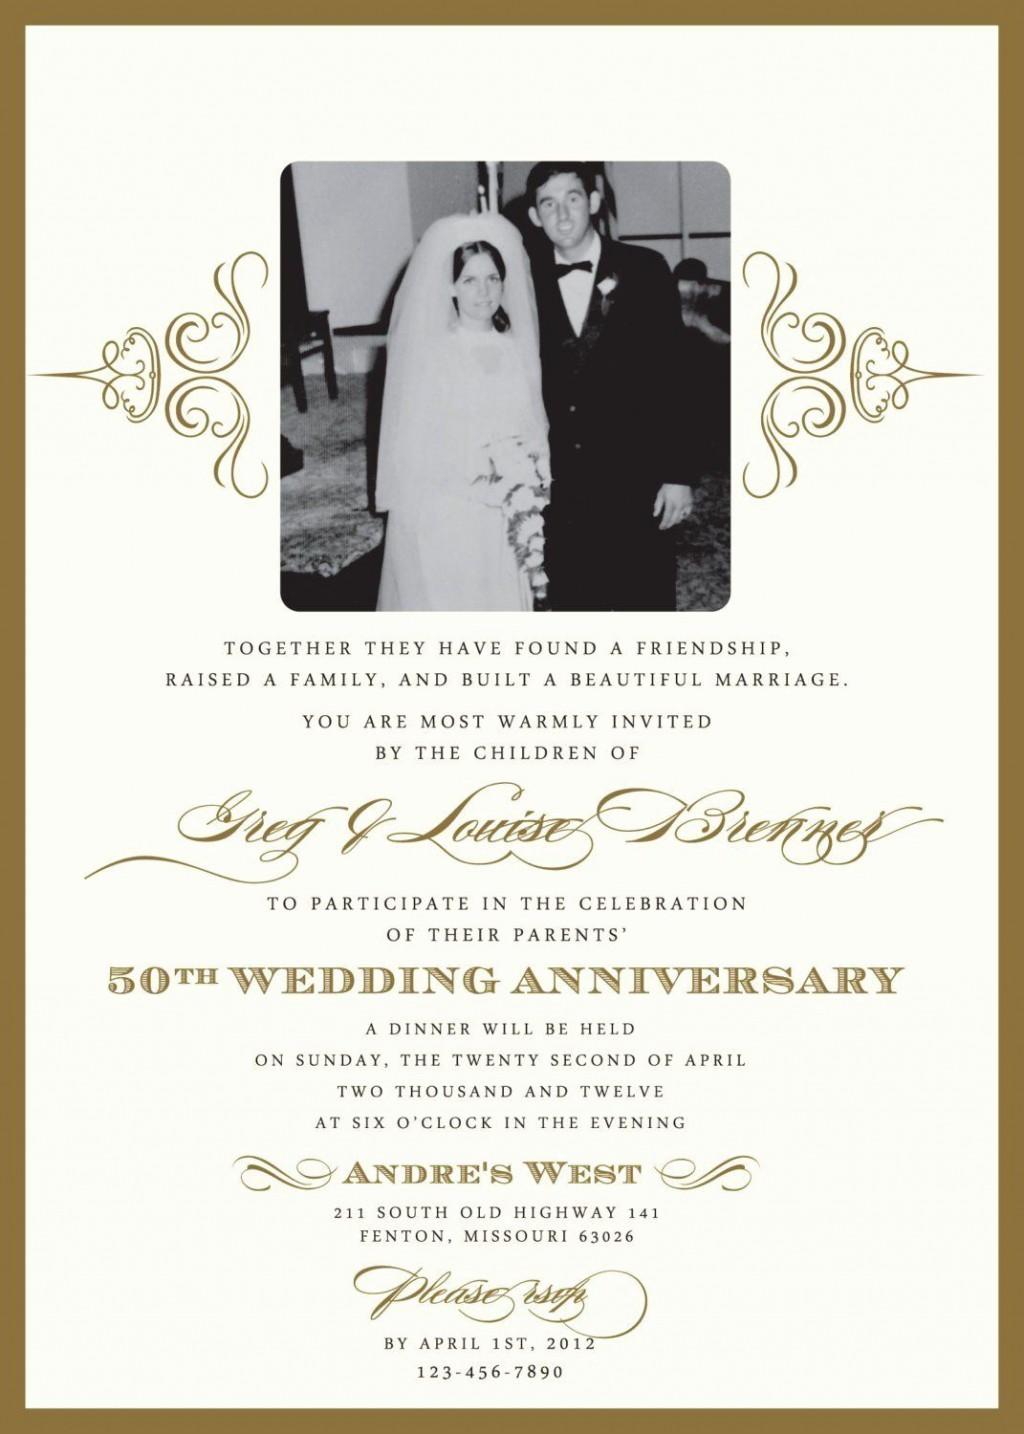 003 Astounding 50th Wedding Anniversary Invitation Template High Resolution  Templates Card Sample GoldenLarge